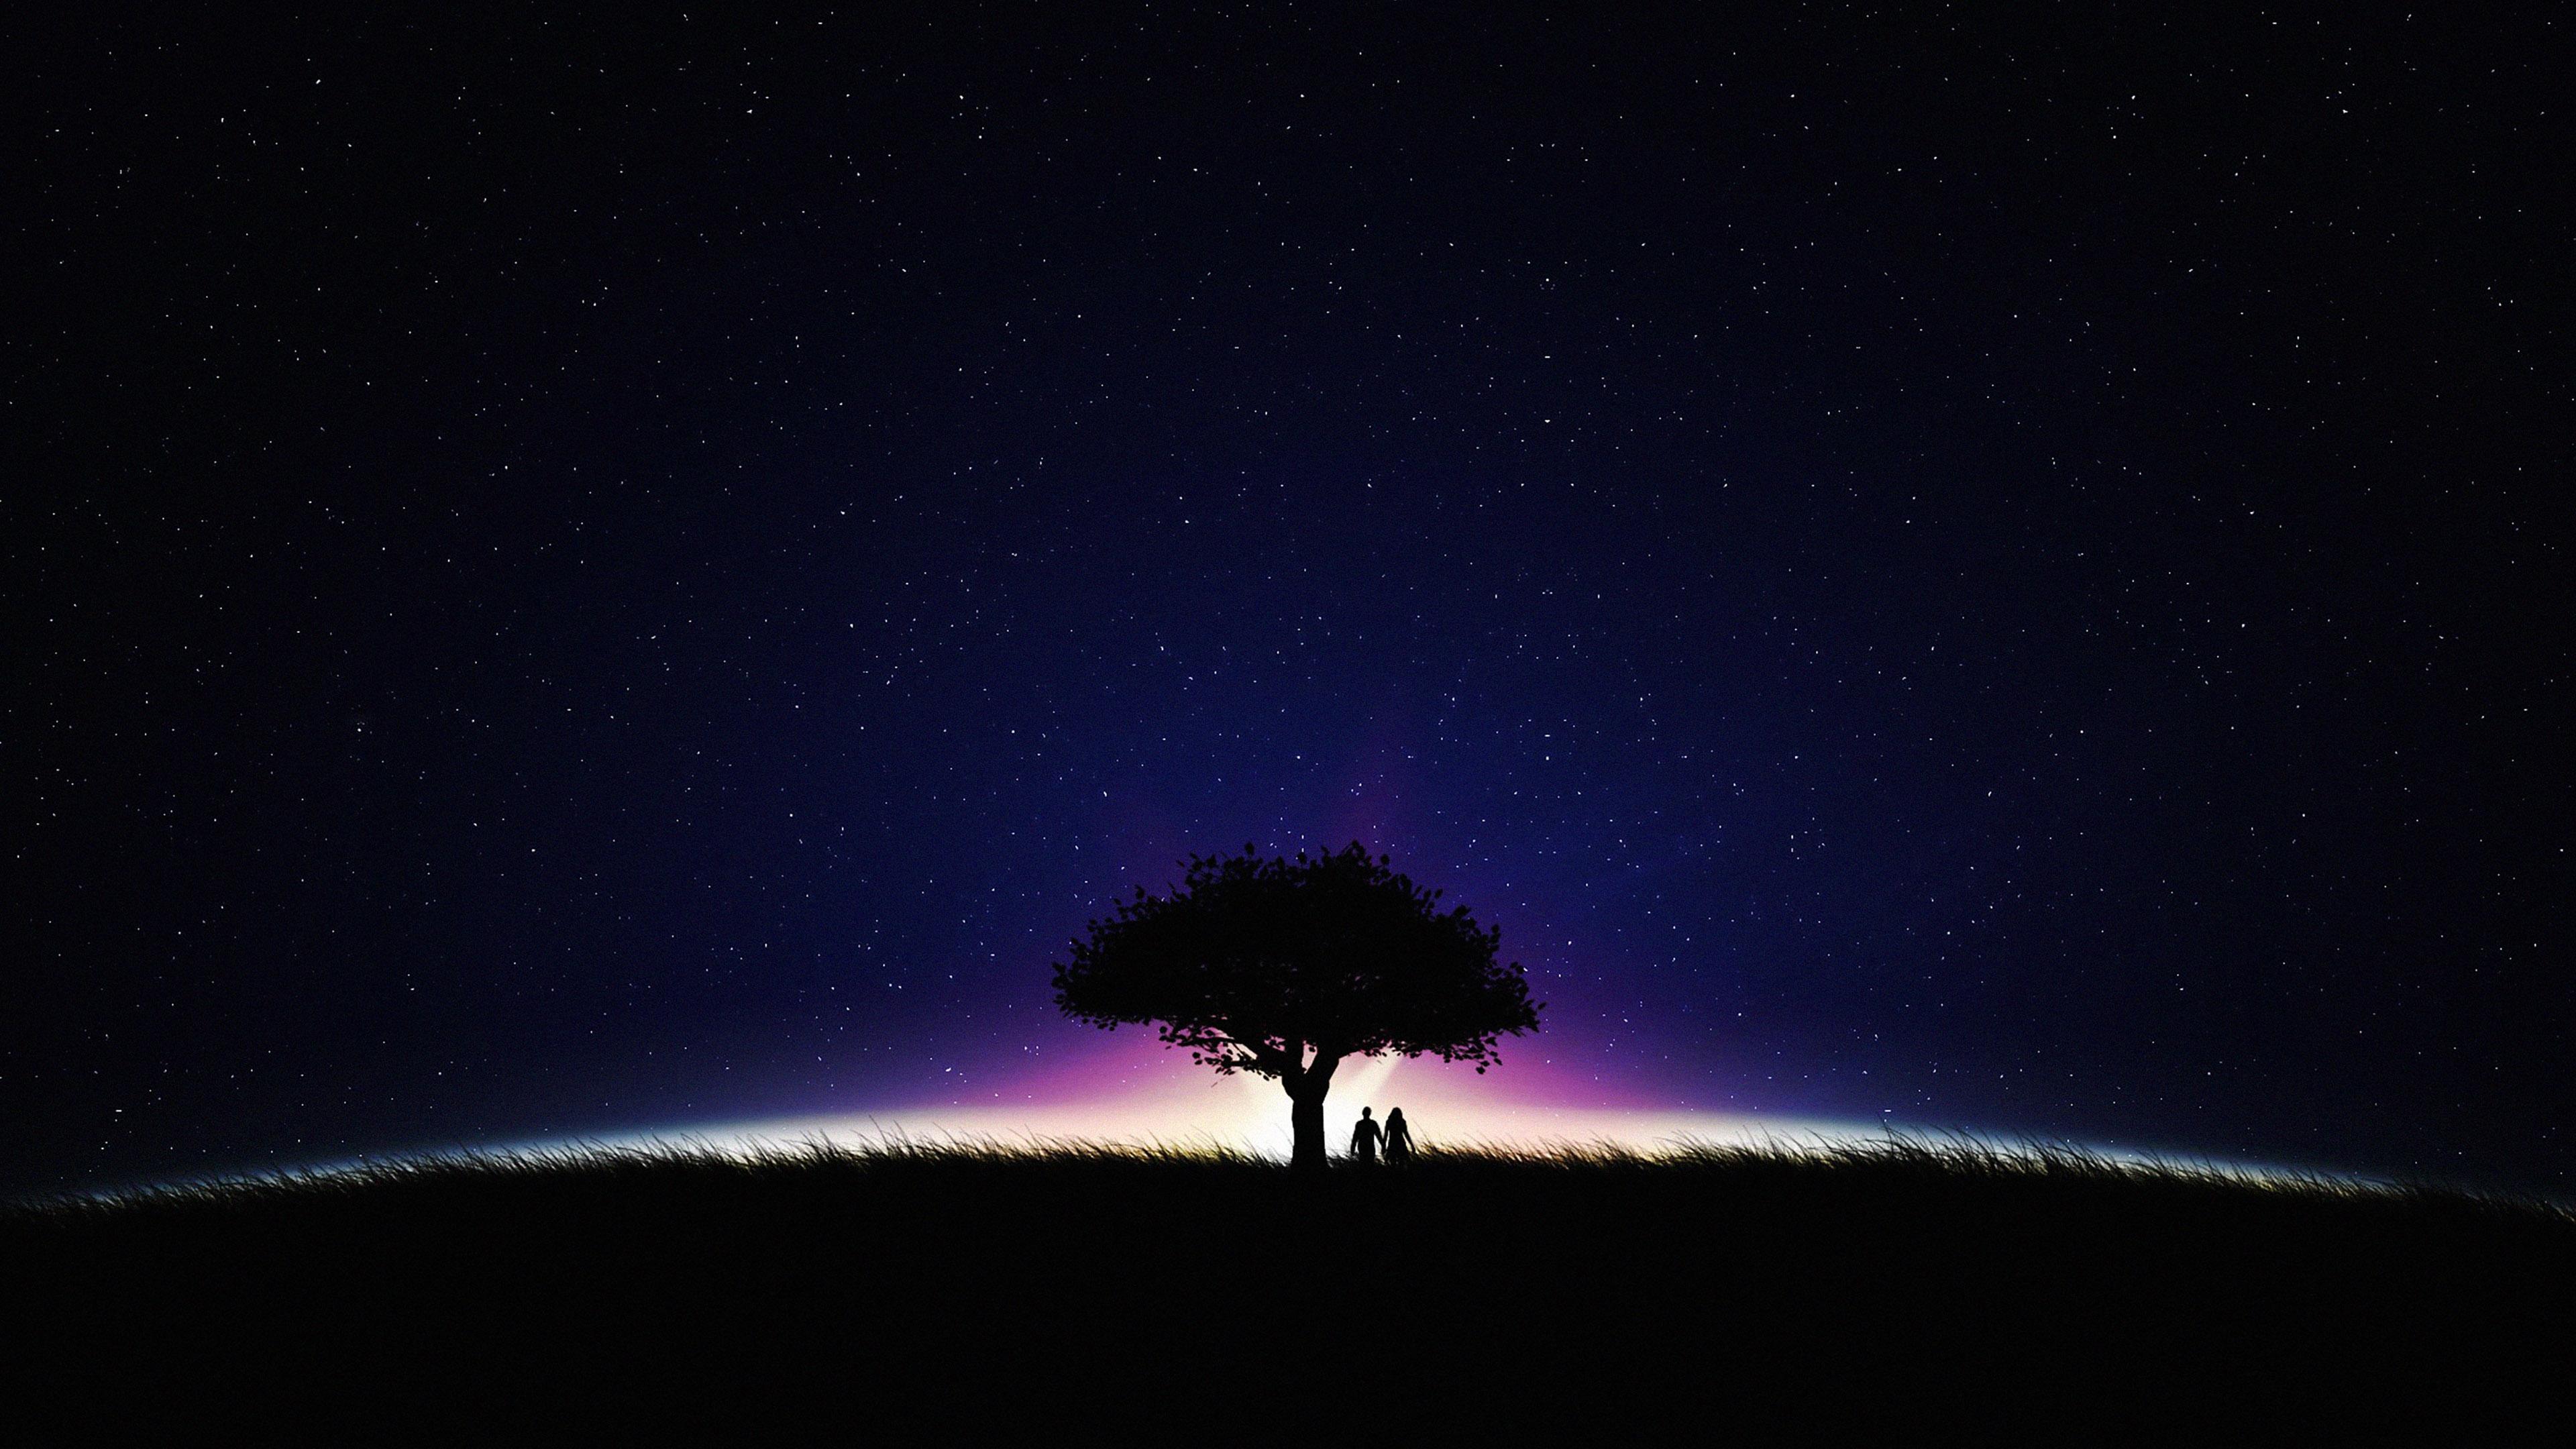 Ab99-wallpaper-space-night-starry-star-dark